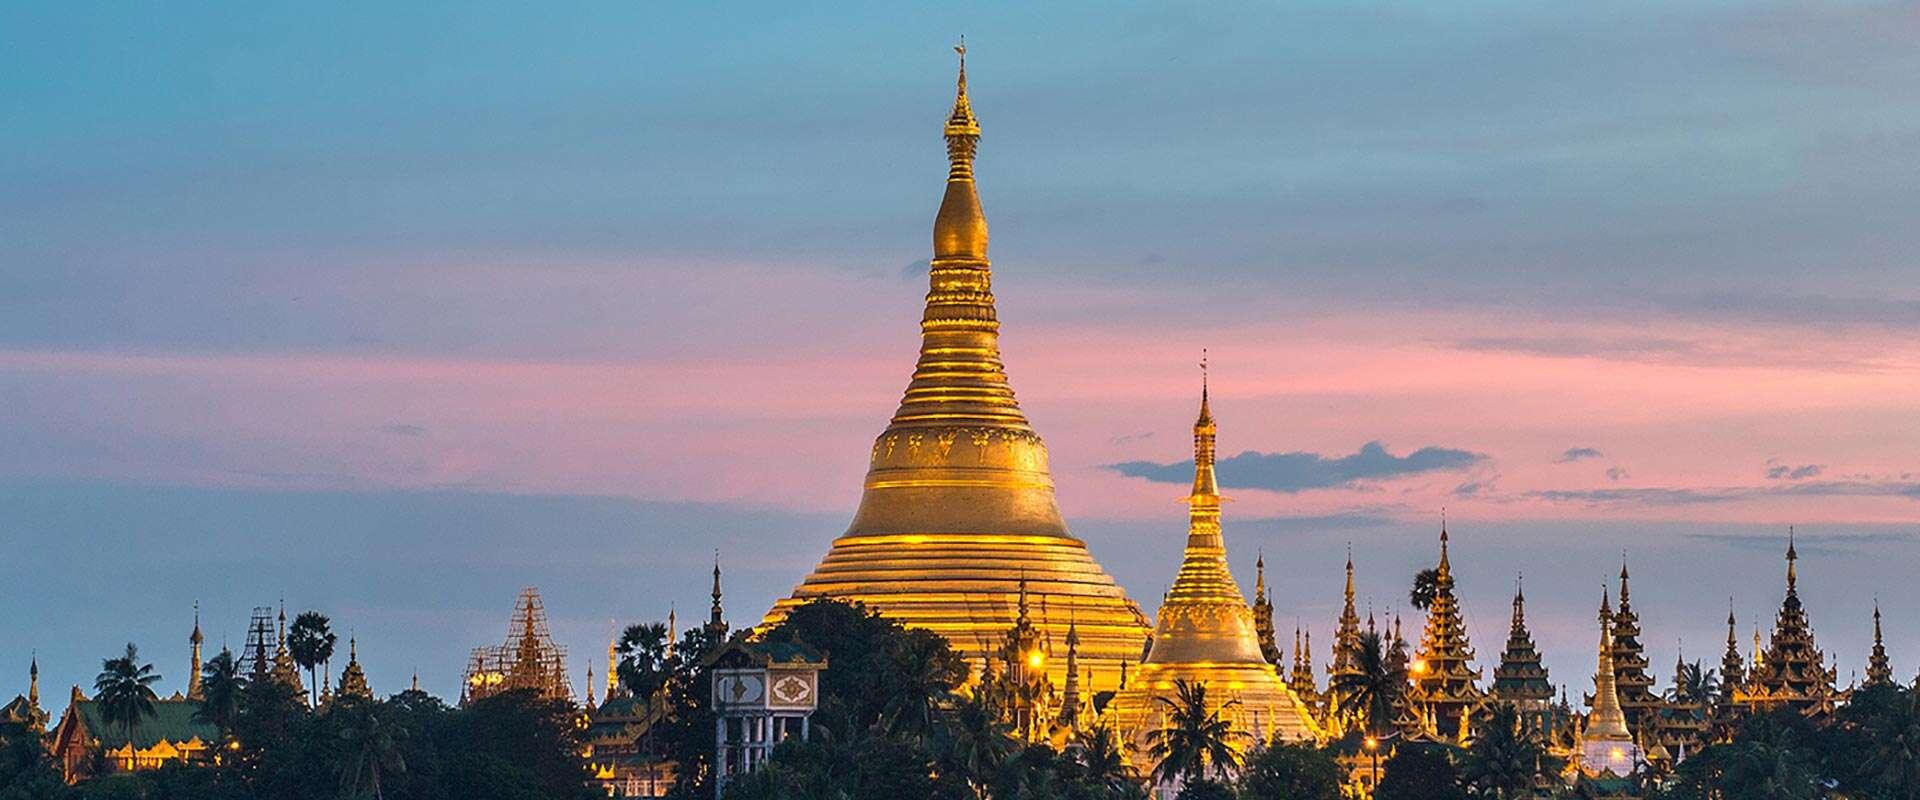 Silver Seas Cruise Mumbai to Phuket November 2019